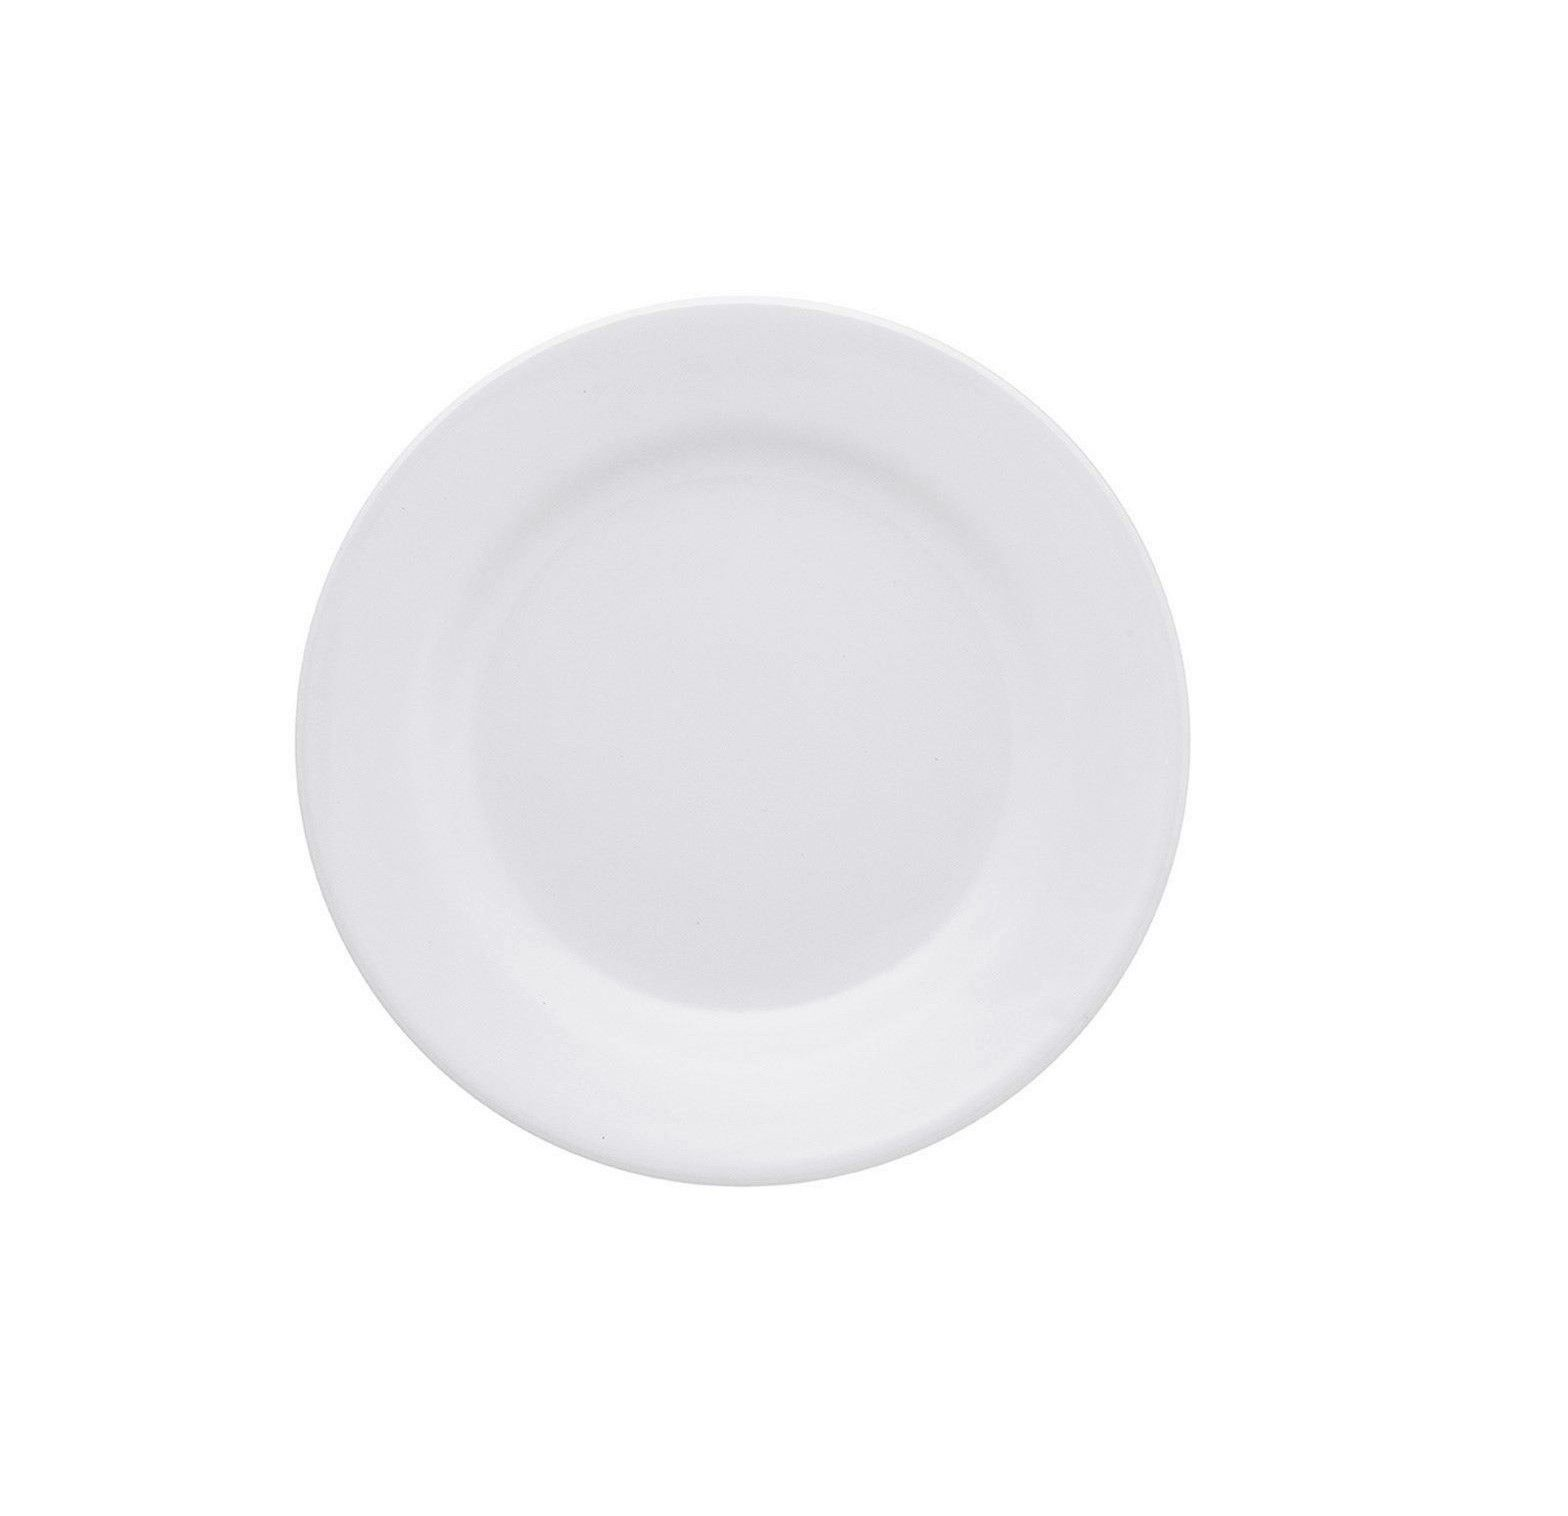 Prato Sobremesa Vitramik Plus 19cm Branco